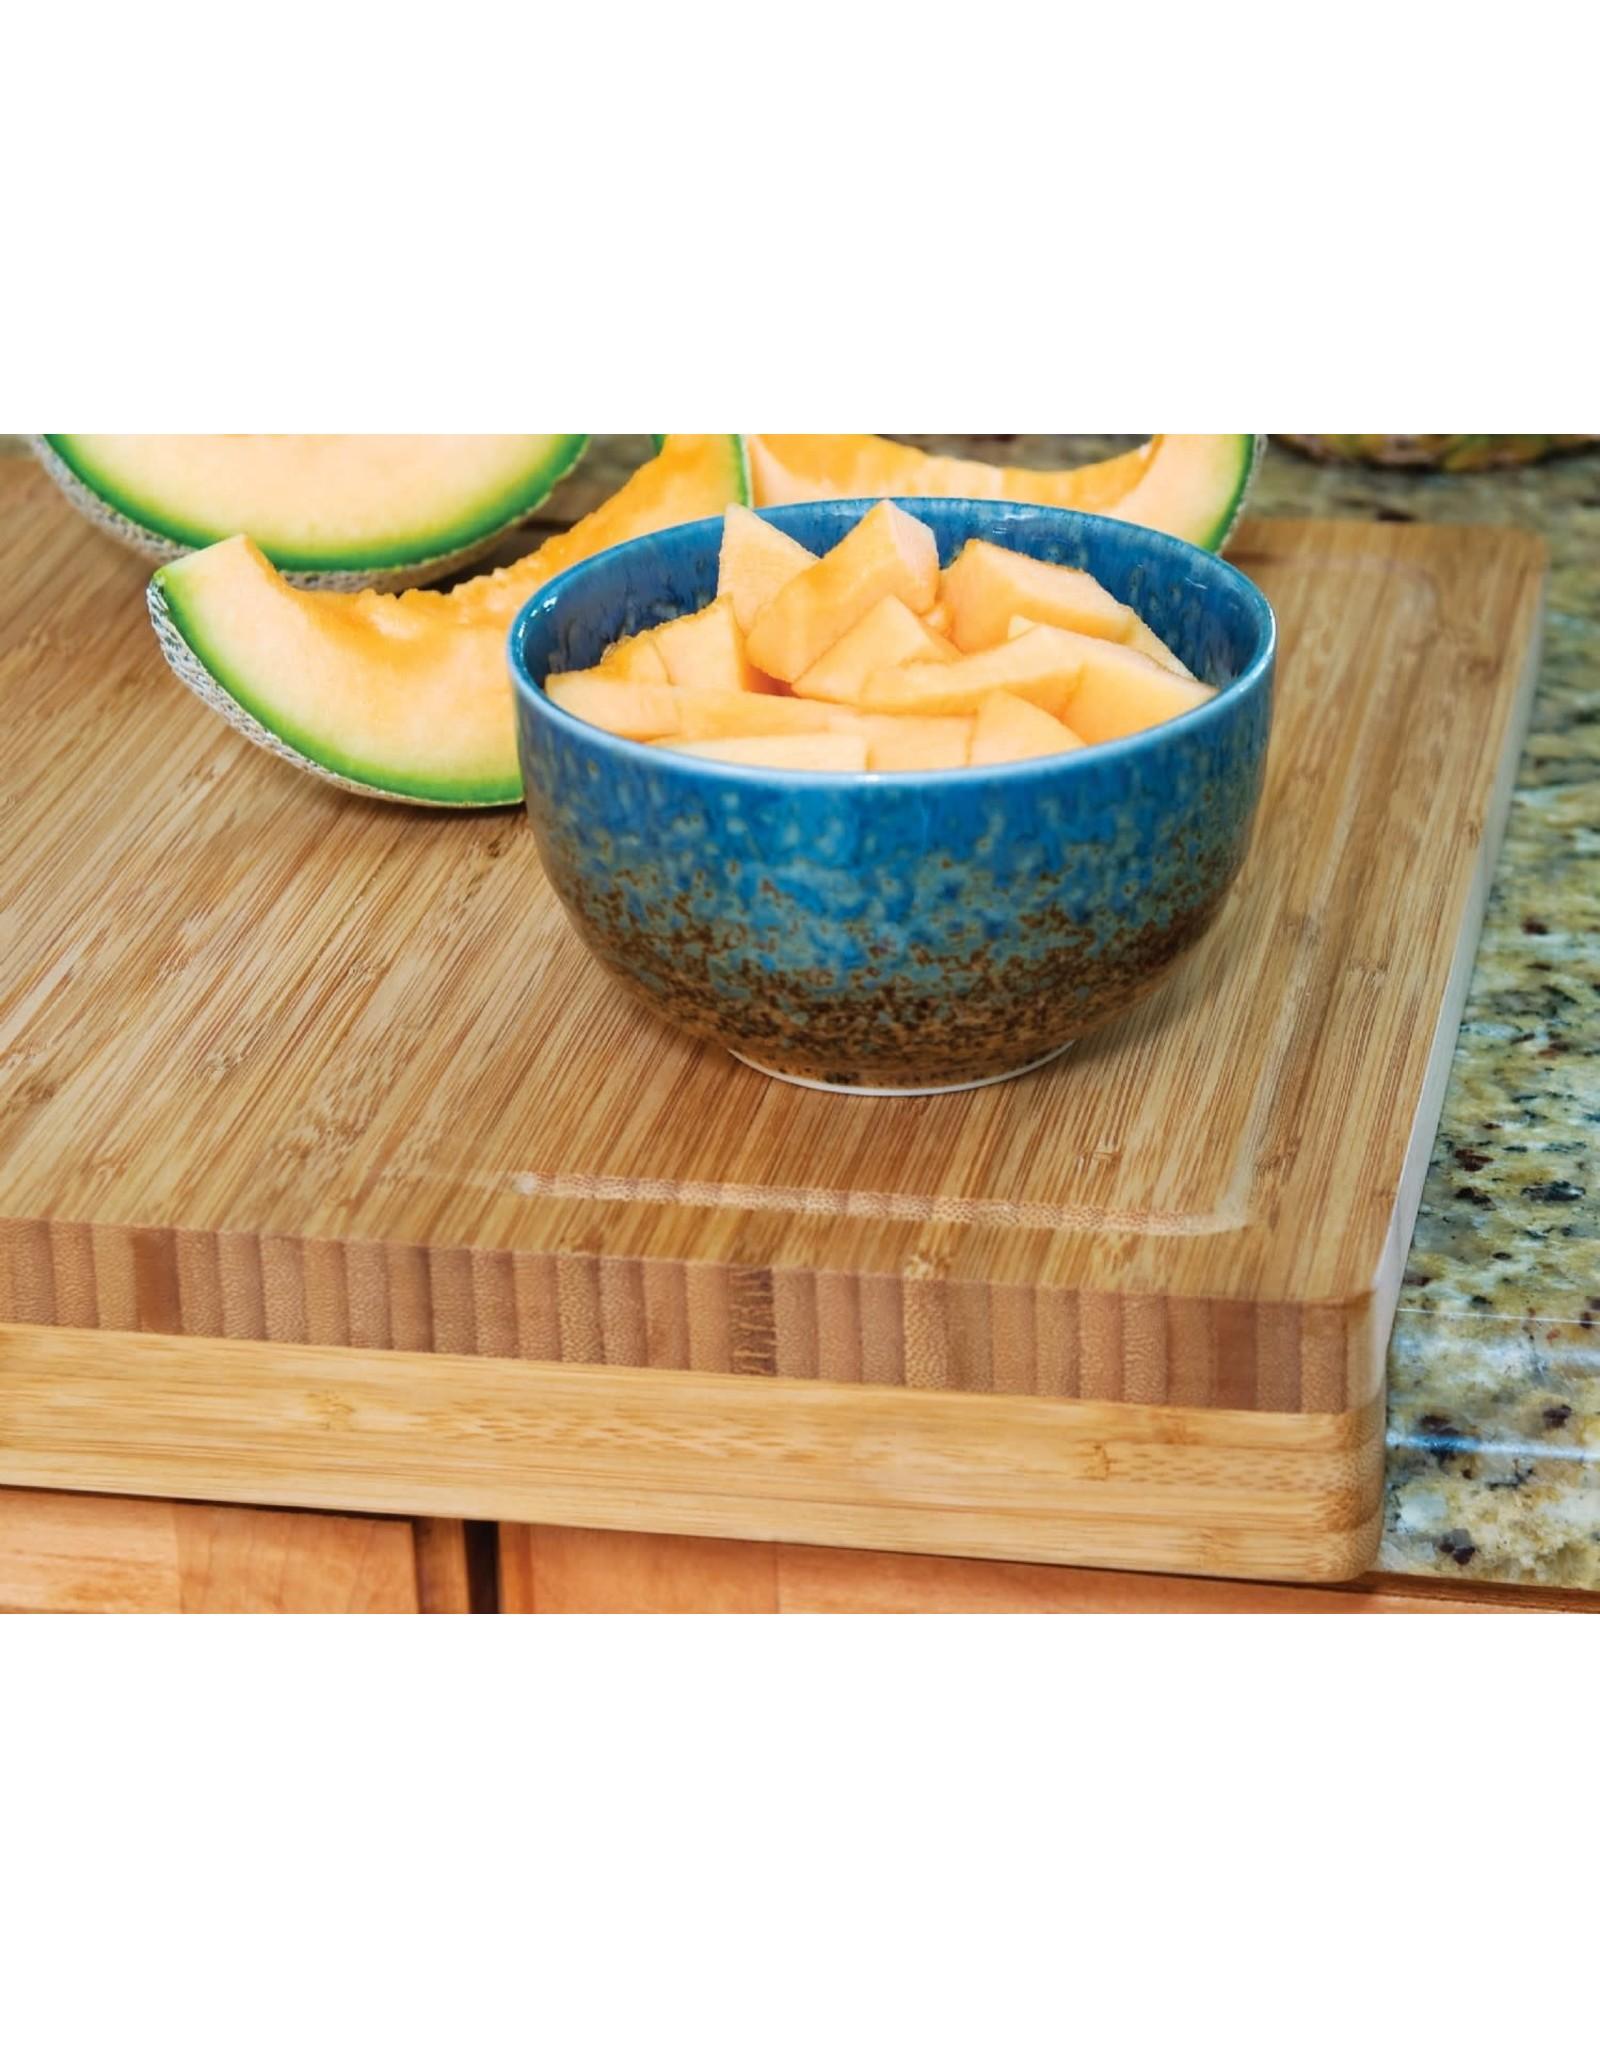 Lipper LIPPER-Bamboo Over-the-Counter-Edge Cutting Board